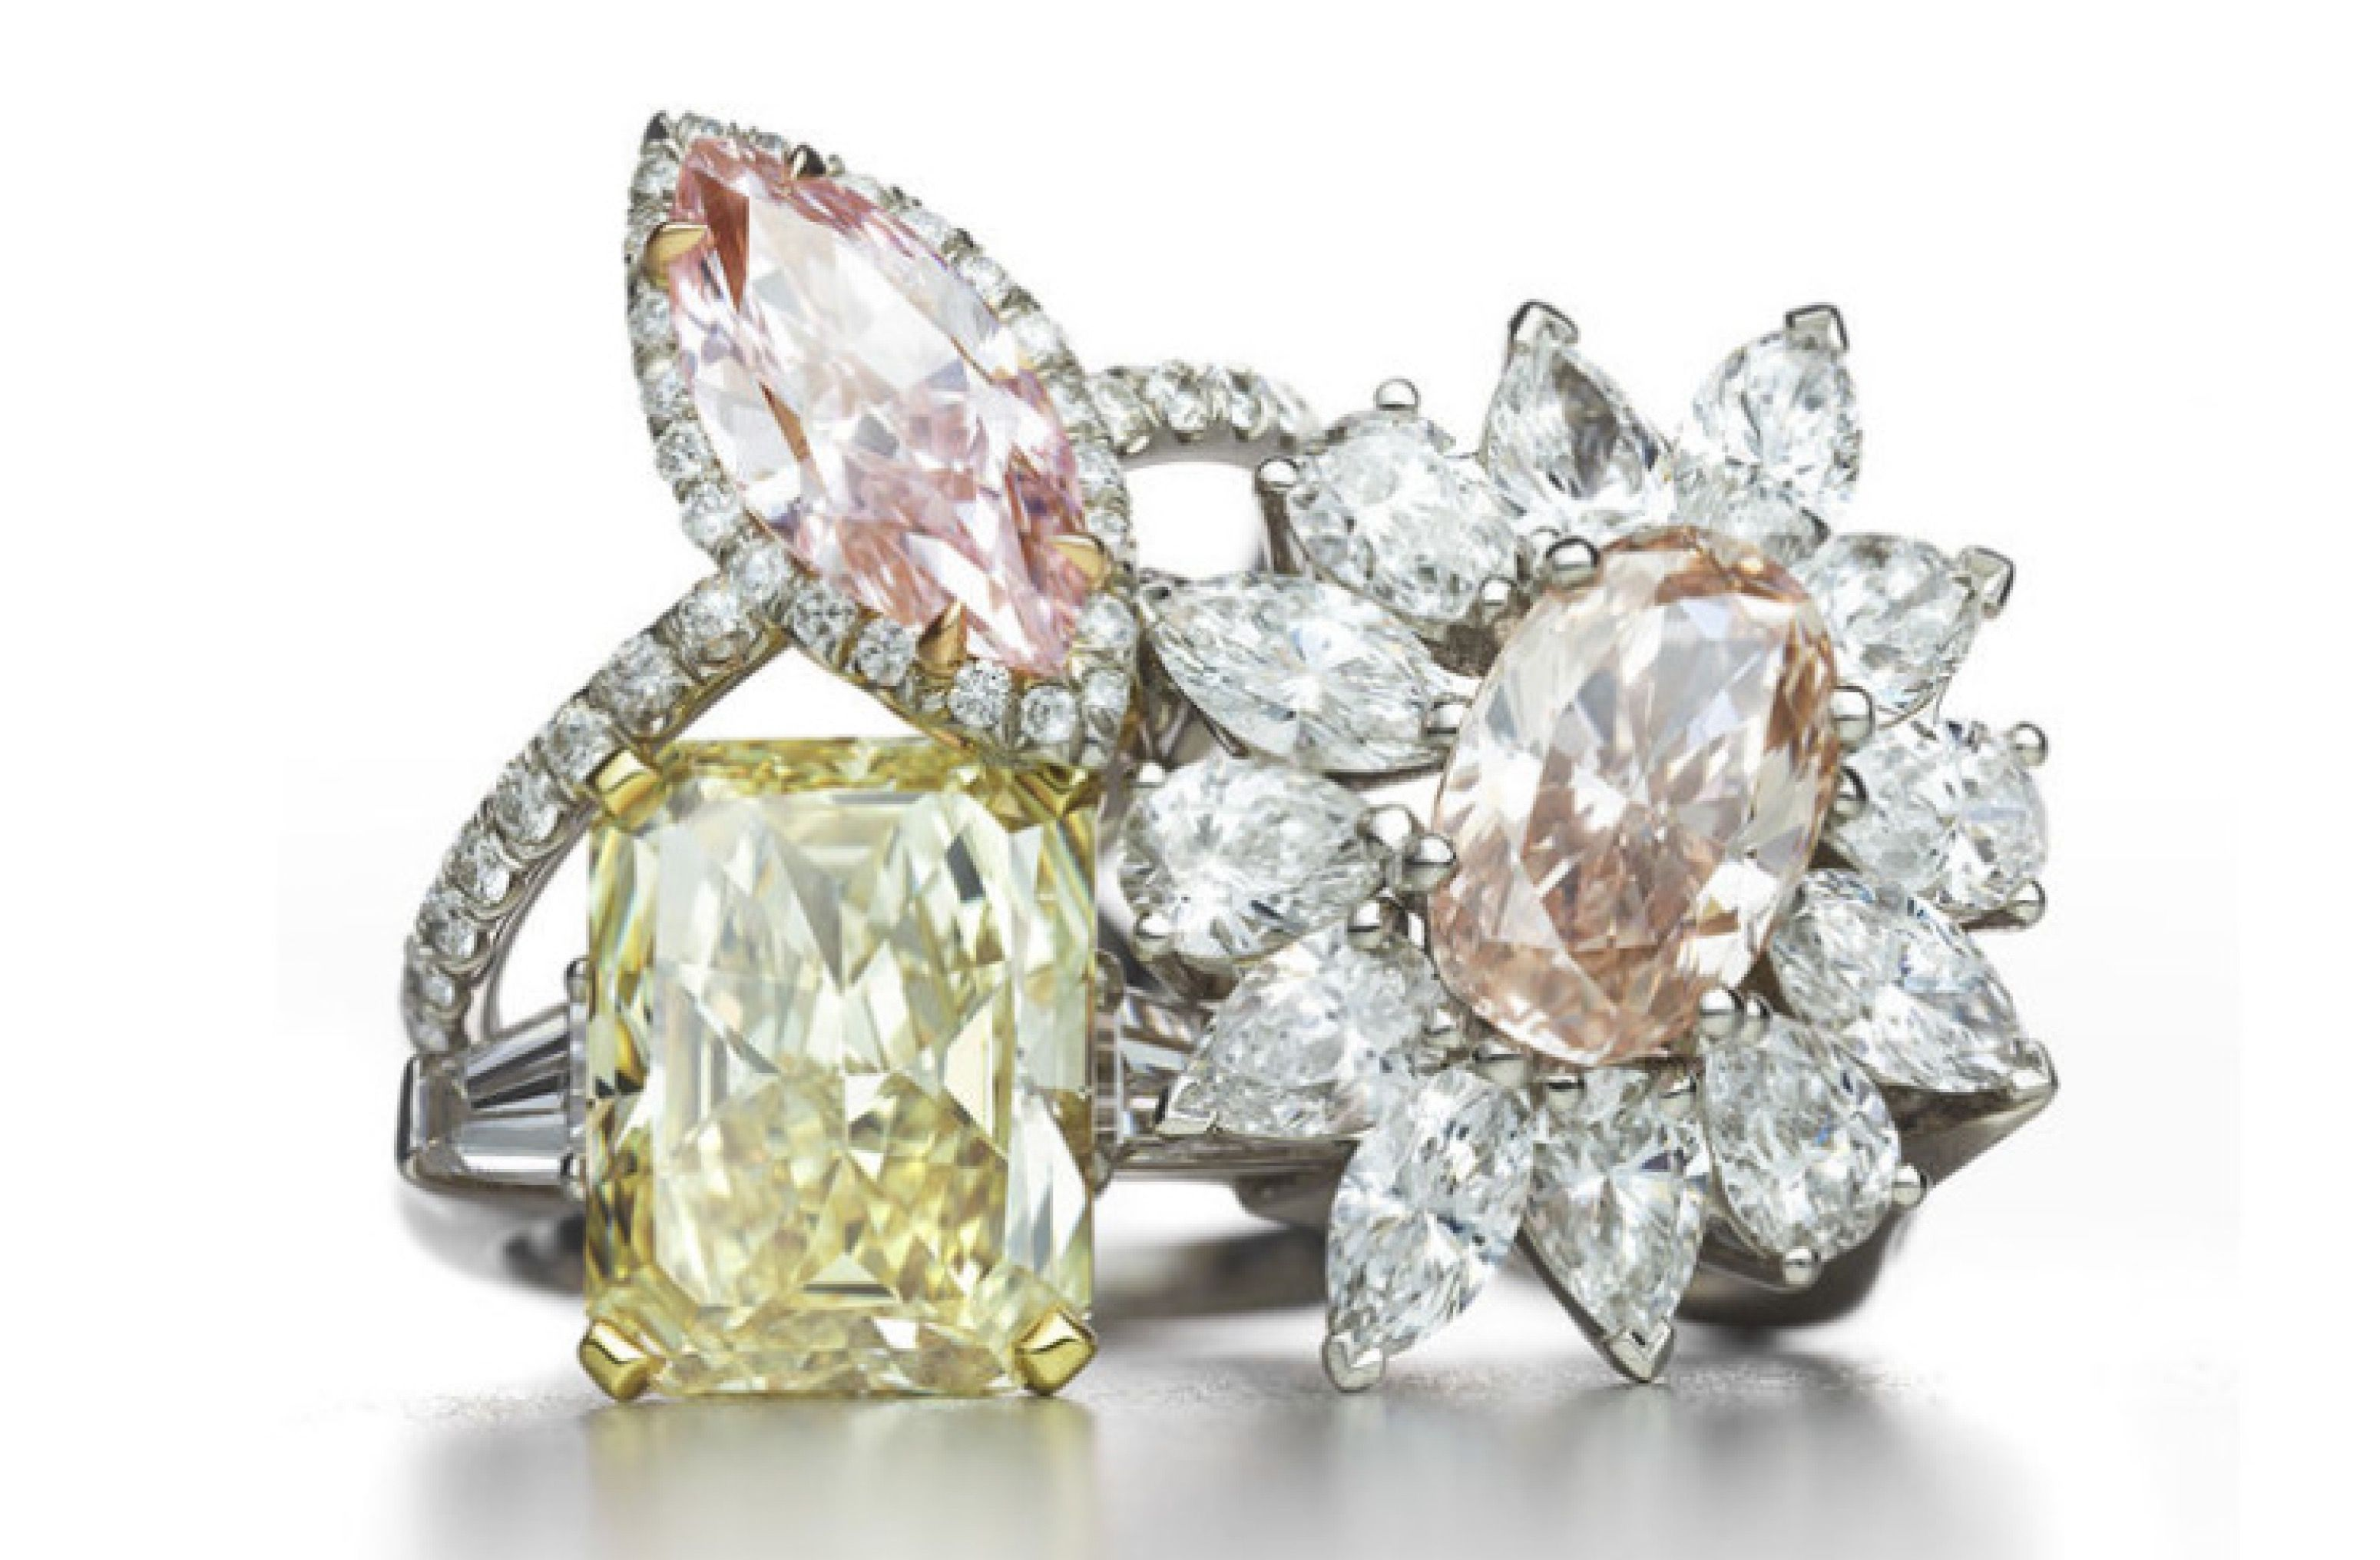 JewelryWhite_03.jpg